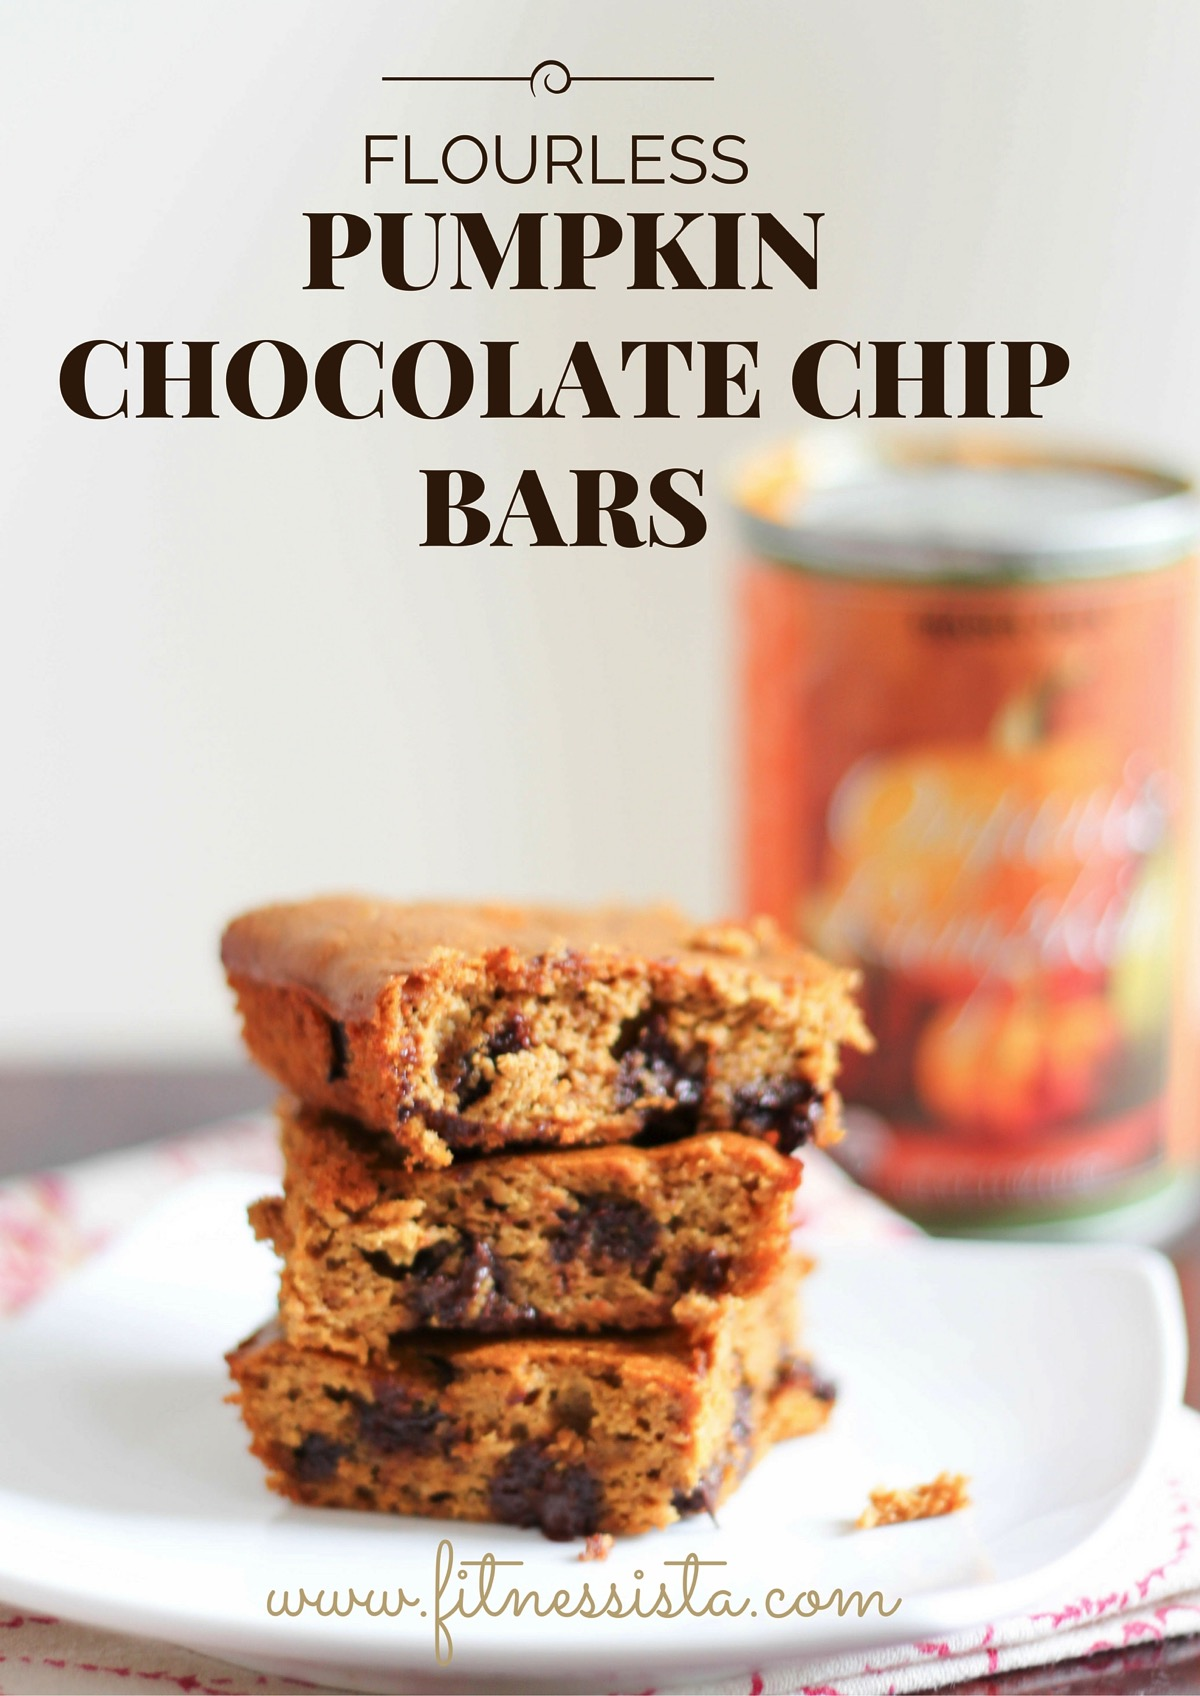 Flourless Pumpkin Chocolate Chip Bars | Recipes for Fall ...